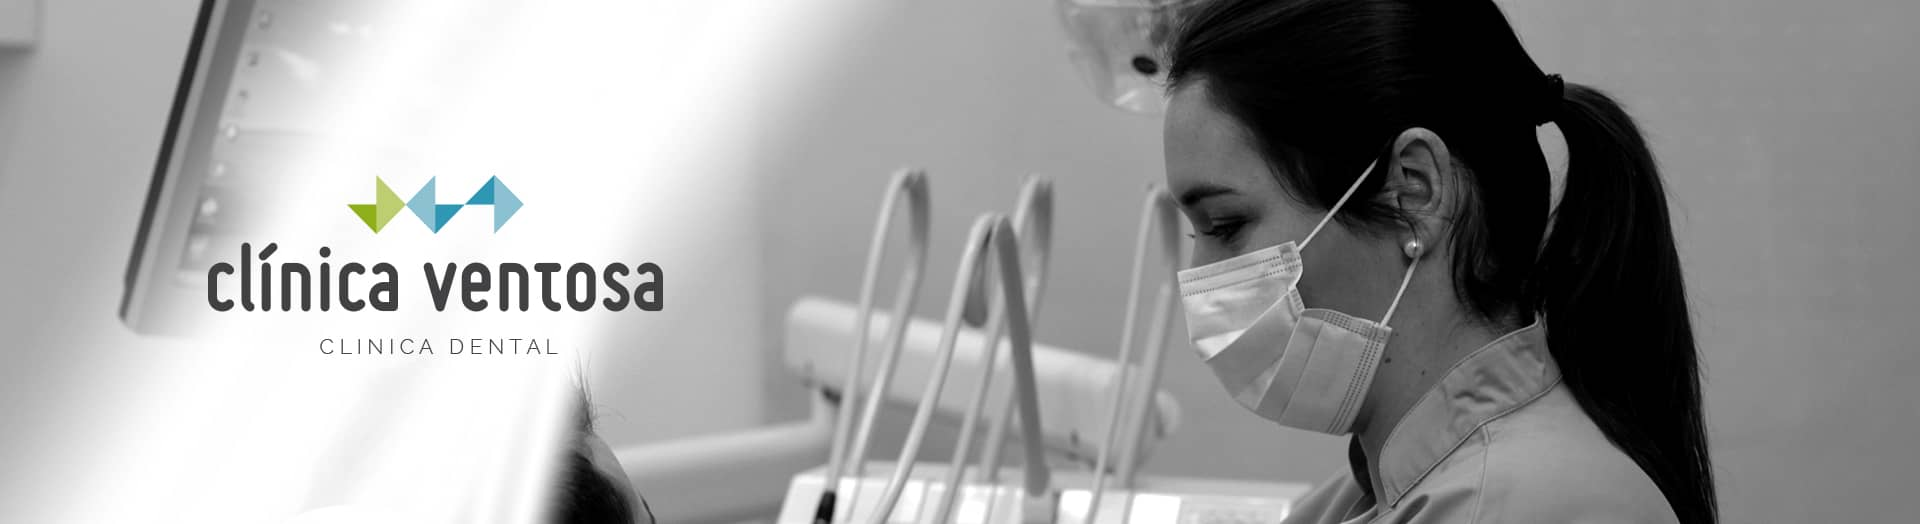 equipo_clinica_dental_ventosa_cordoba